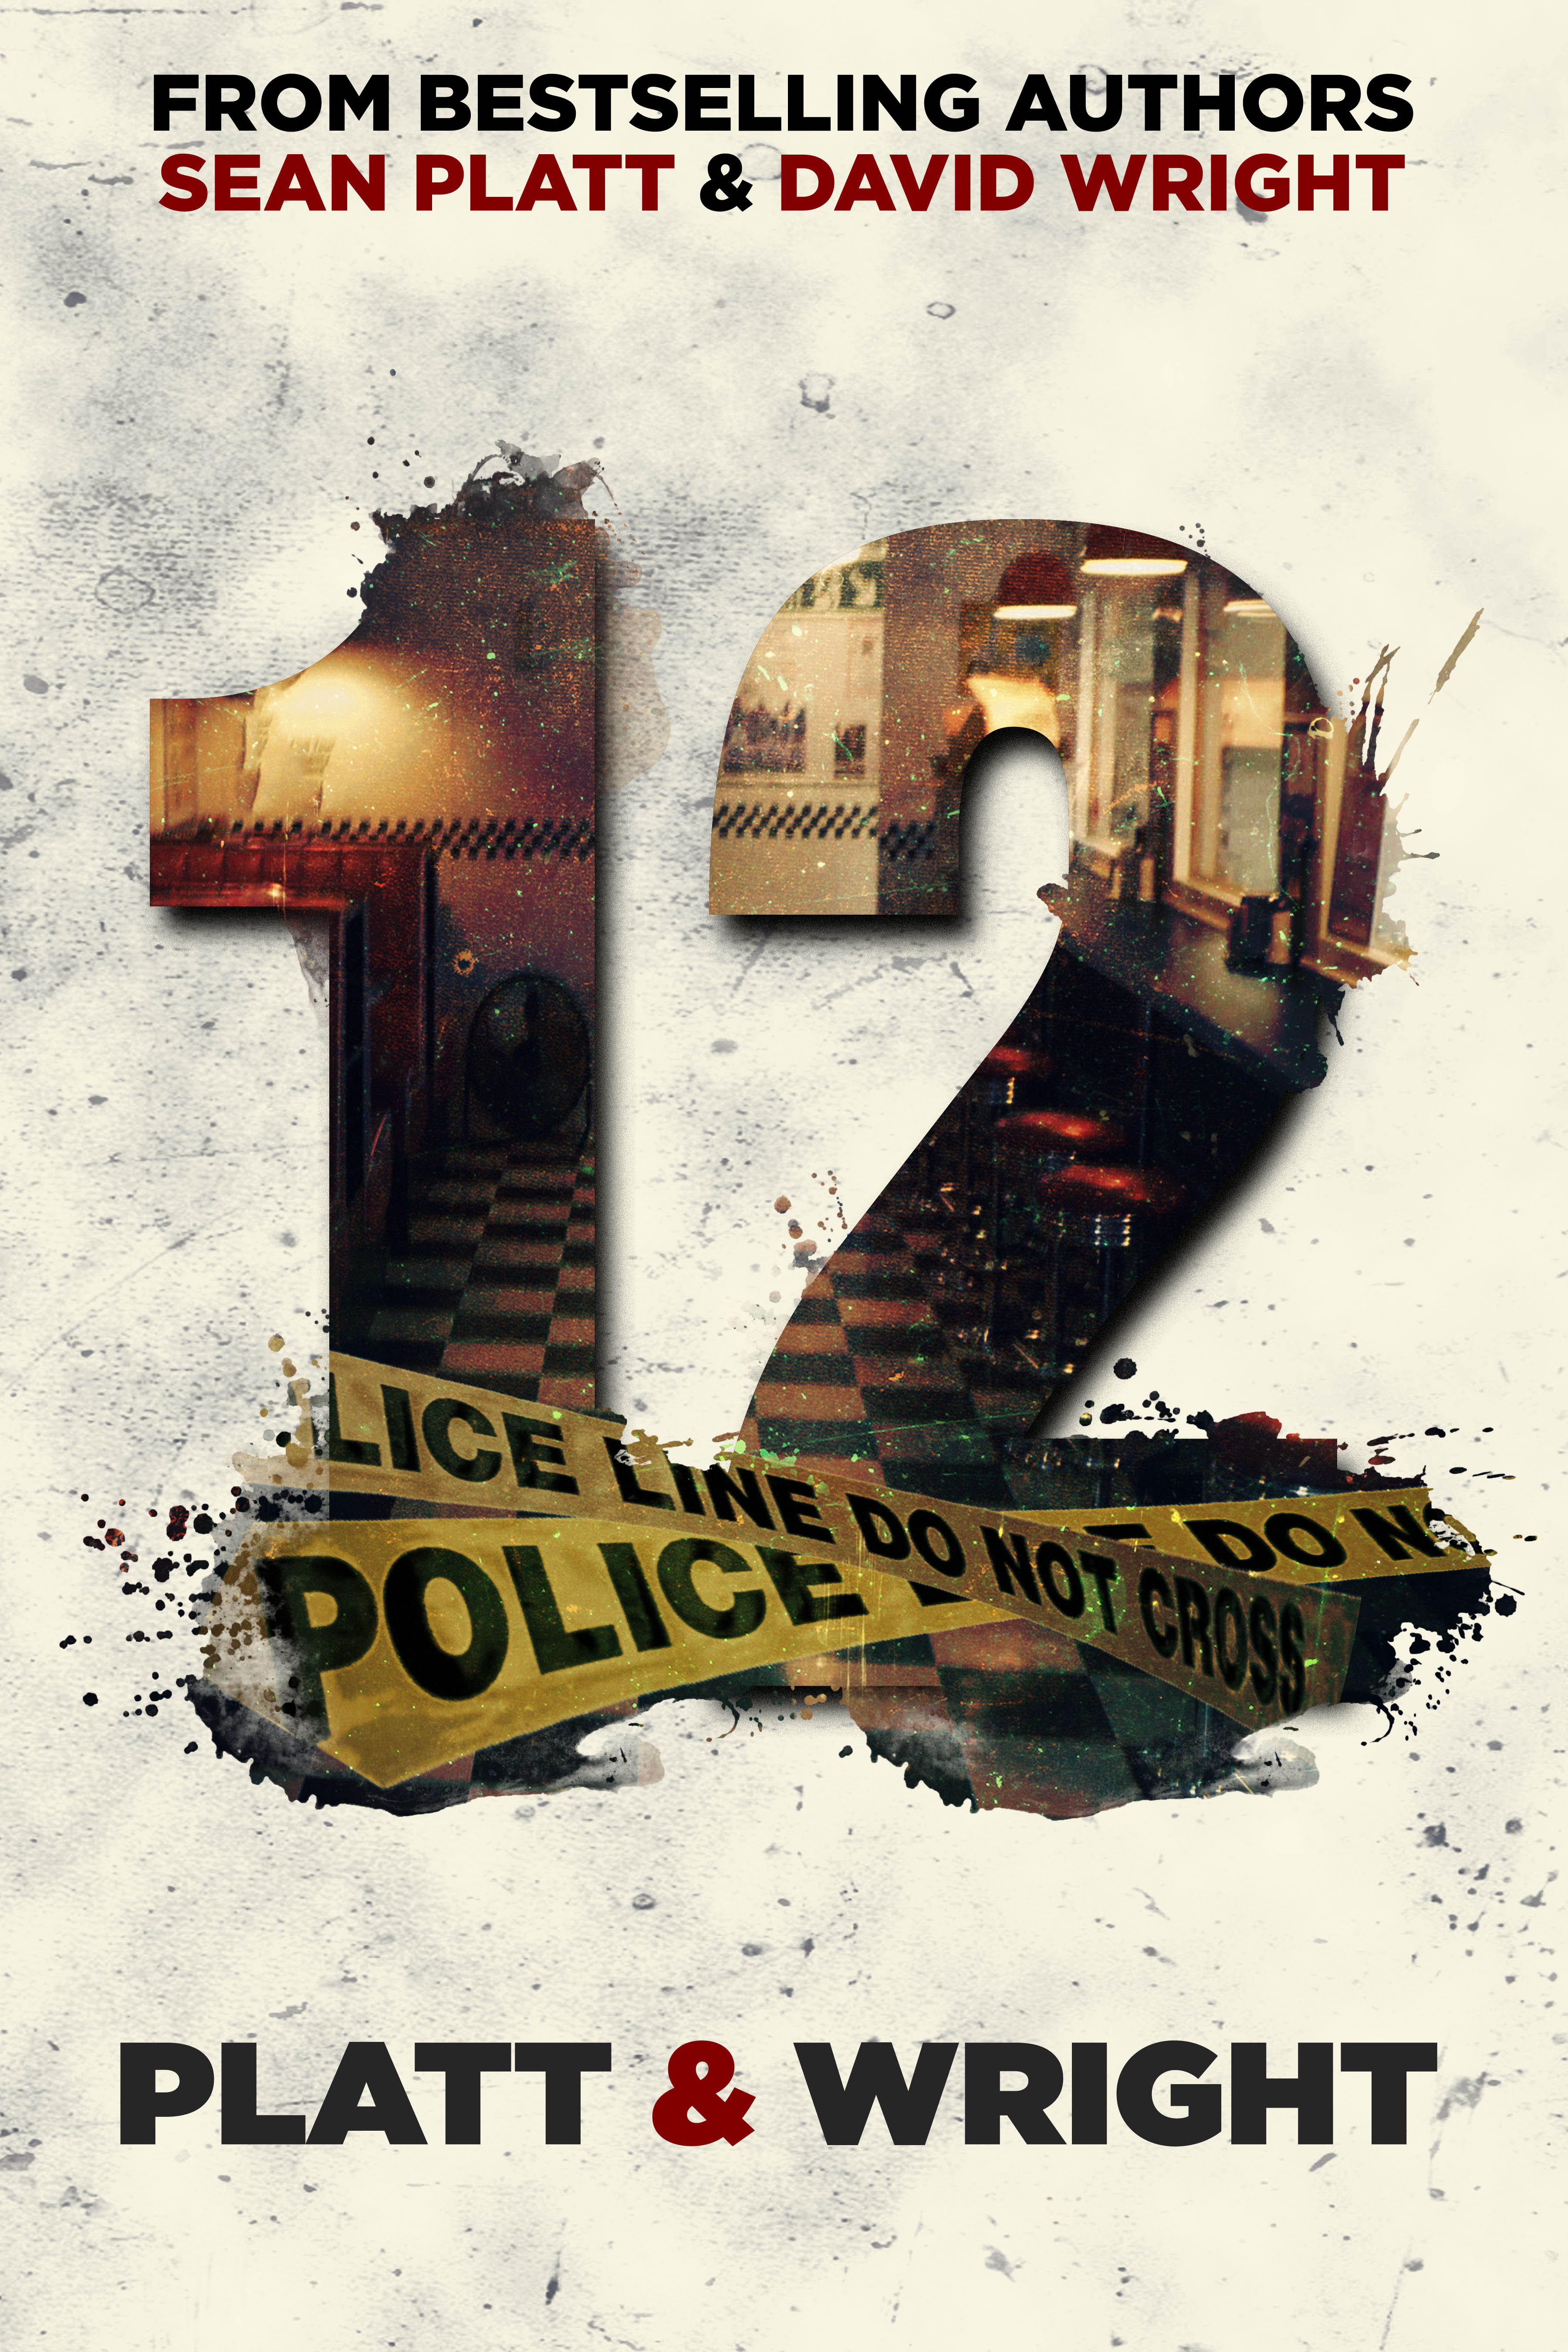 12: A novel by Sean Platt & David Wright